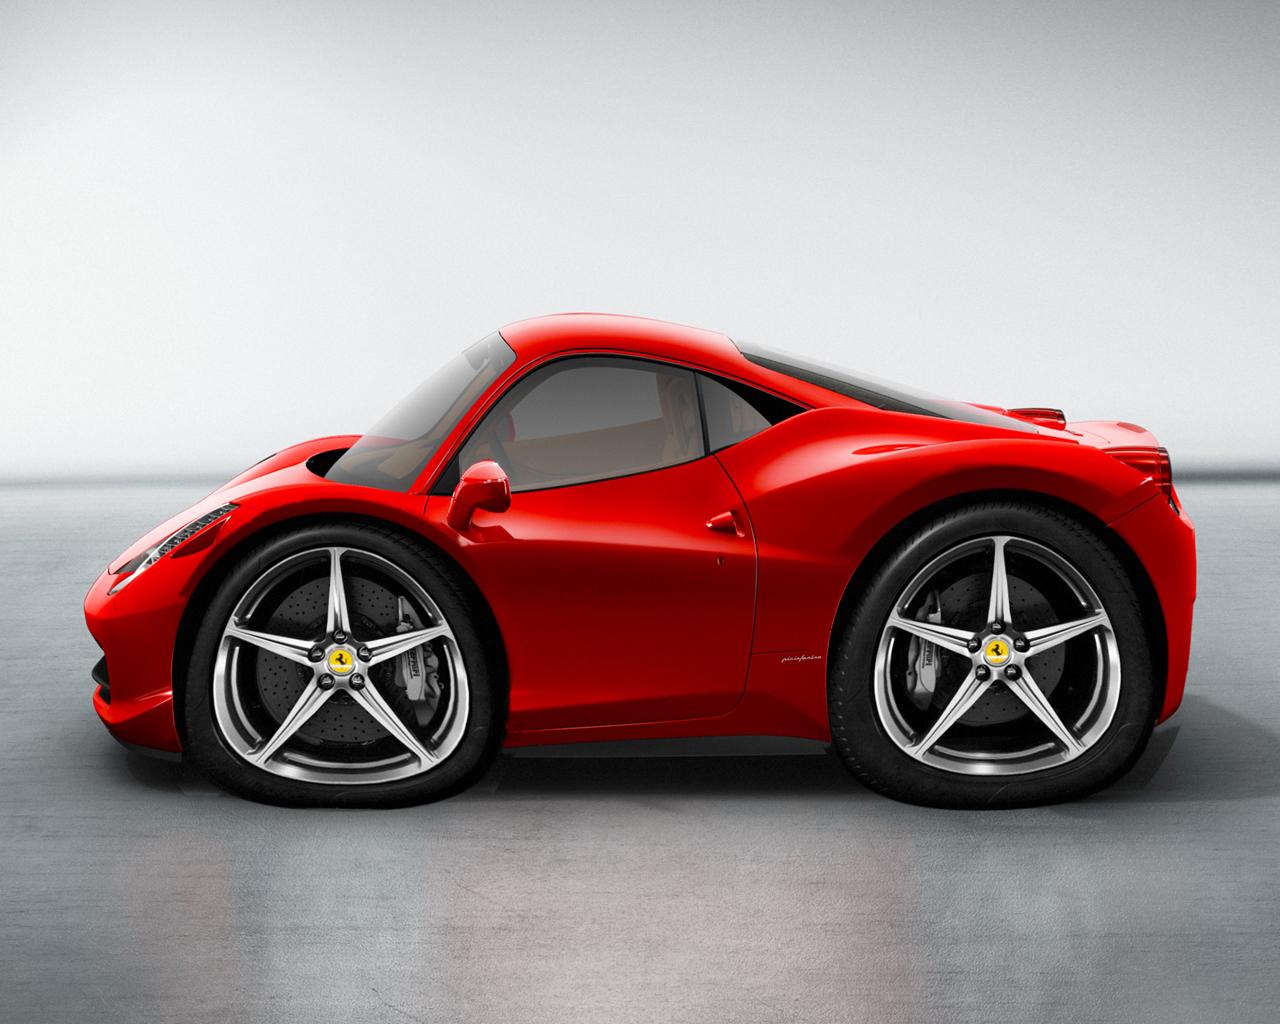 Car Toon New Ferrari 458 By P3p70 On Deviantart